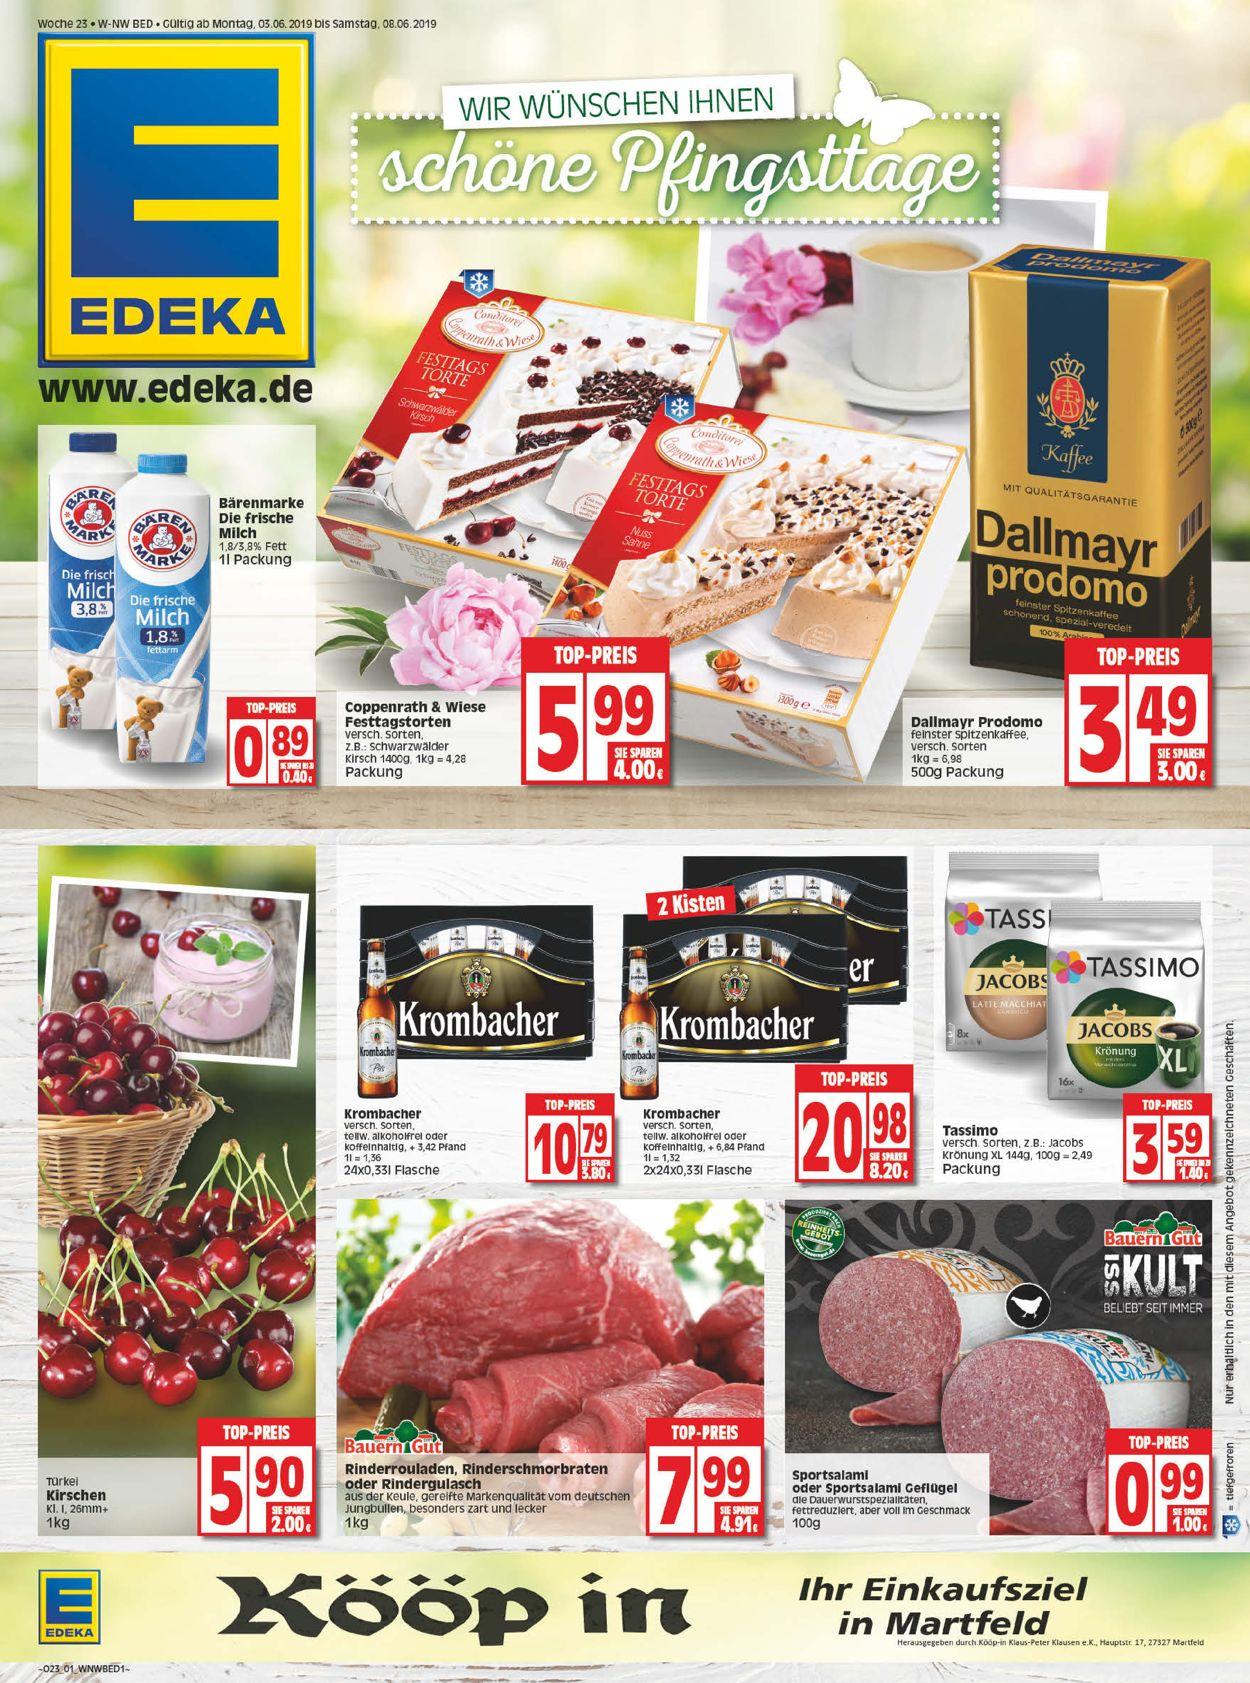 Edeka Prospekt - Aktuell vom 03.06-08.06.2019